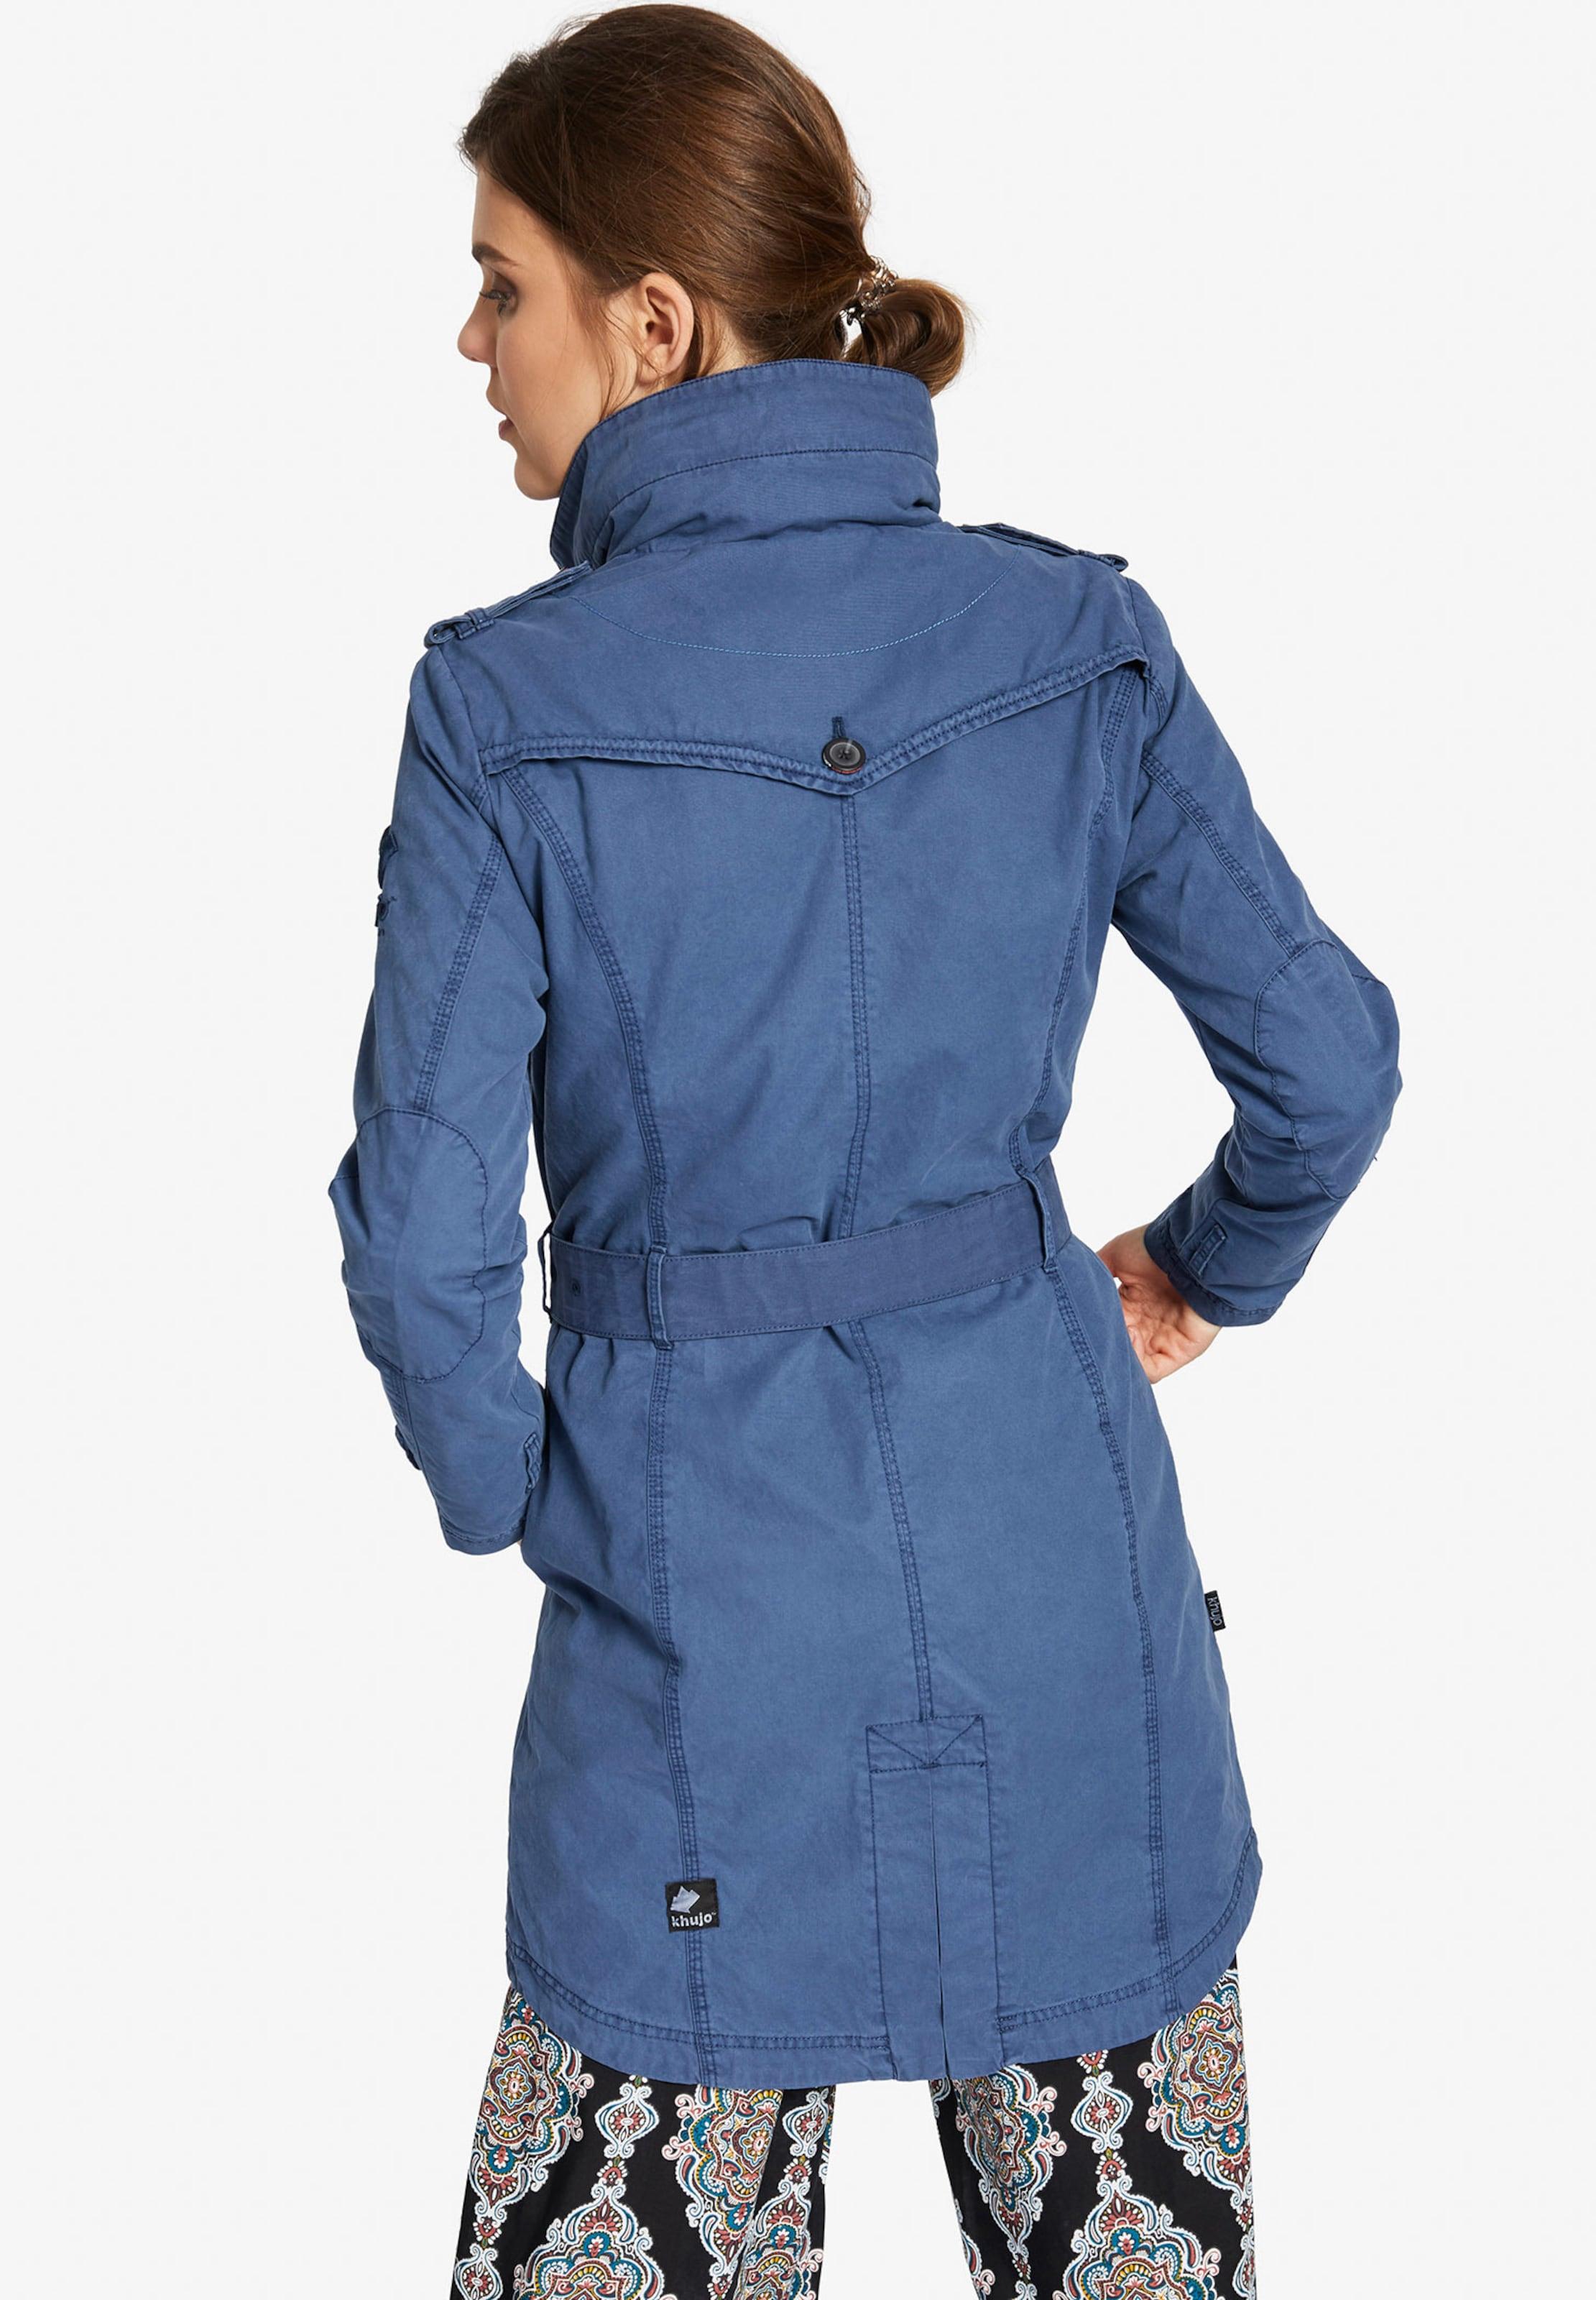 Menna Blue DenimWei Mantel ' Khujo In PiZkXu